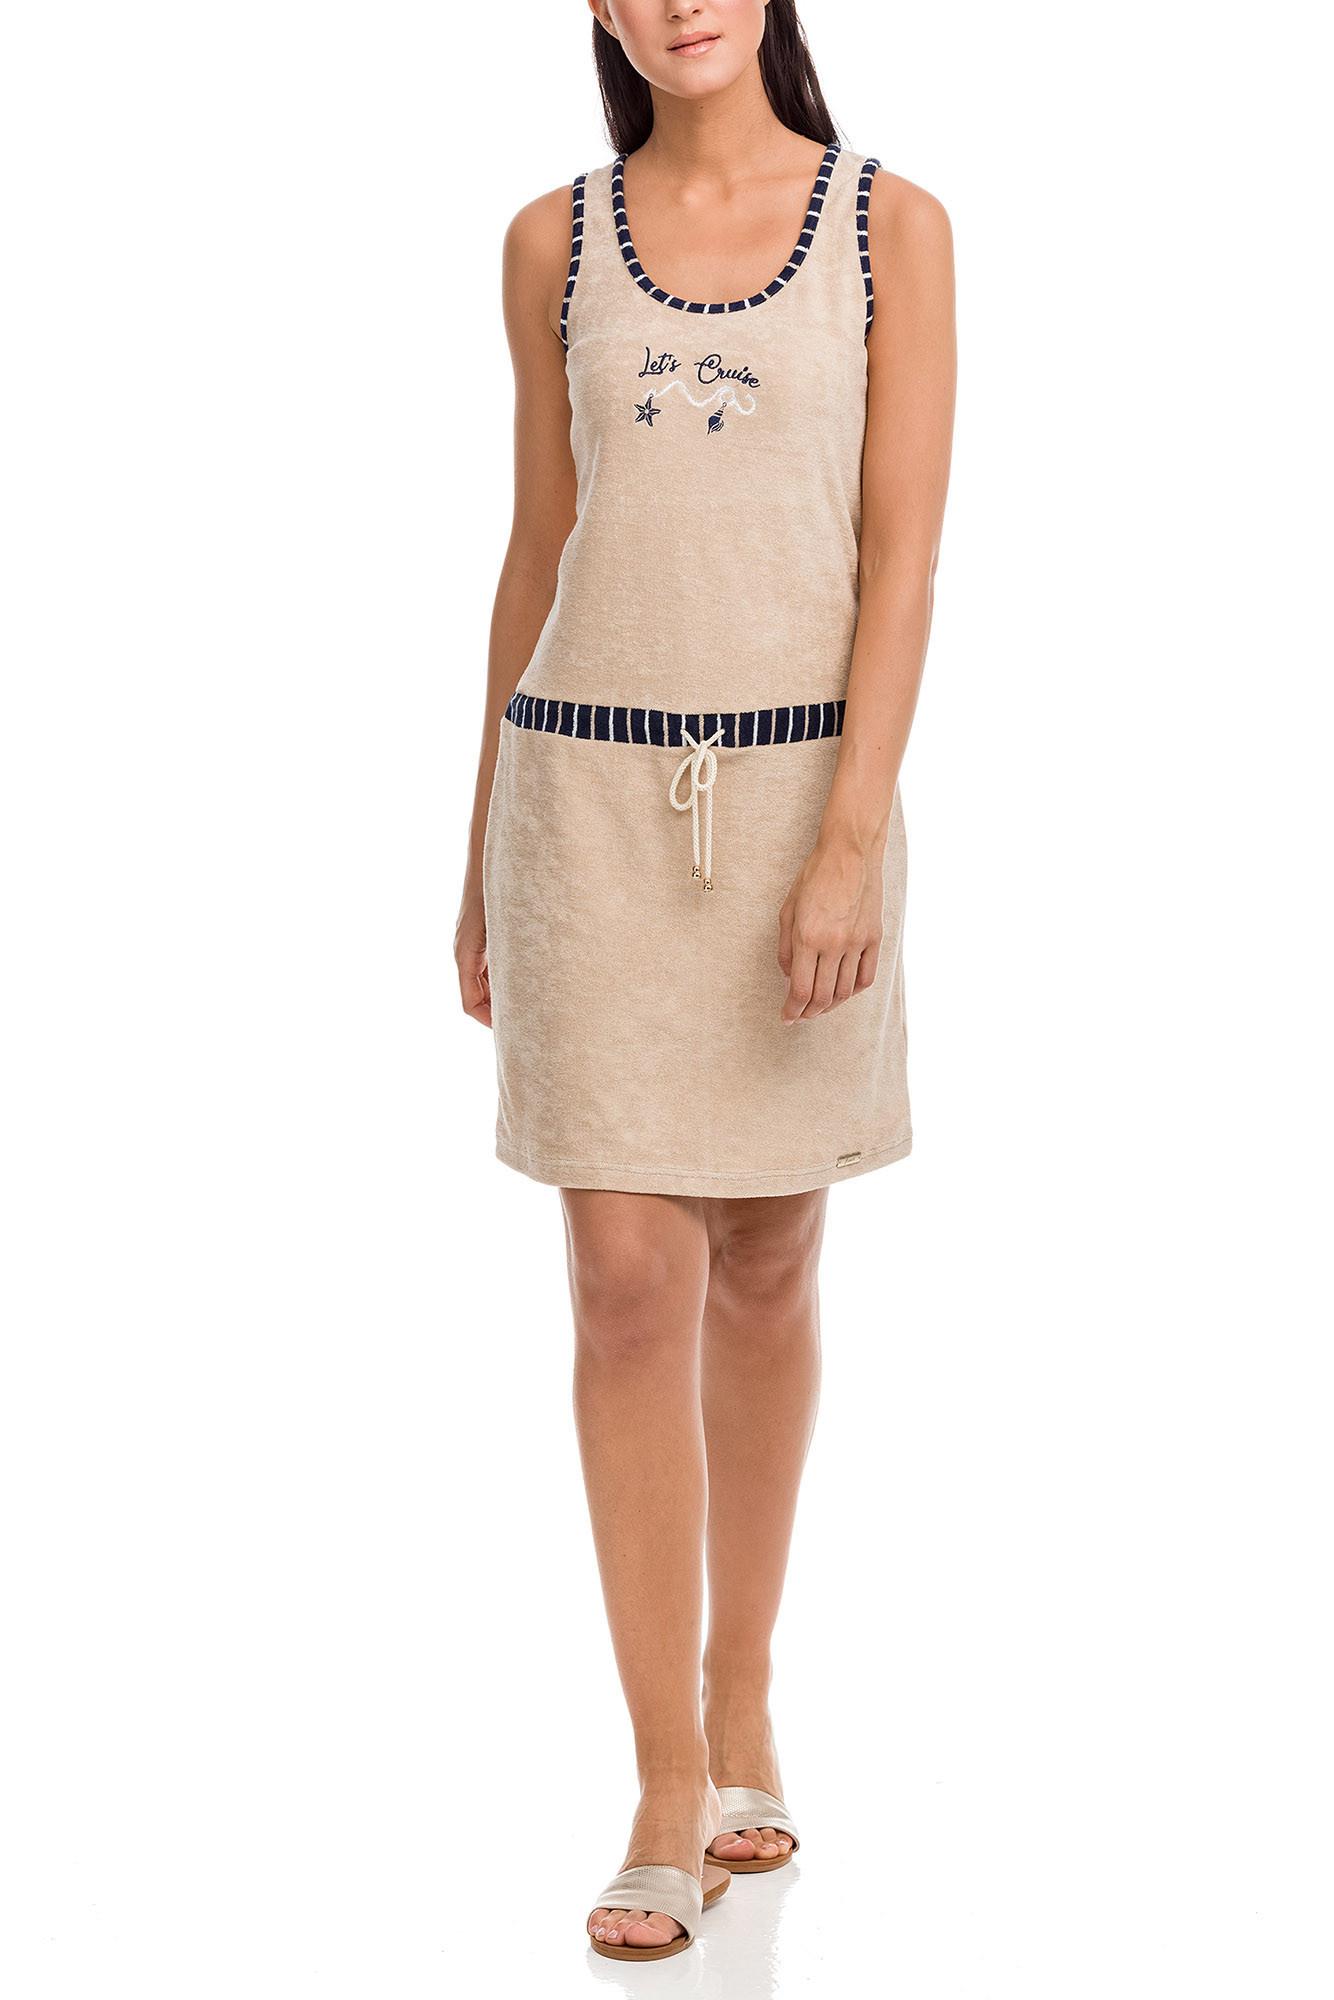 Vamp - Dámske šaty 12578 - Vamp beige peach m